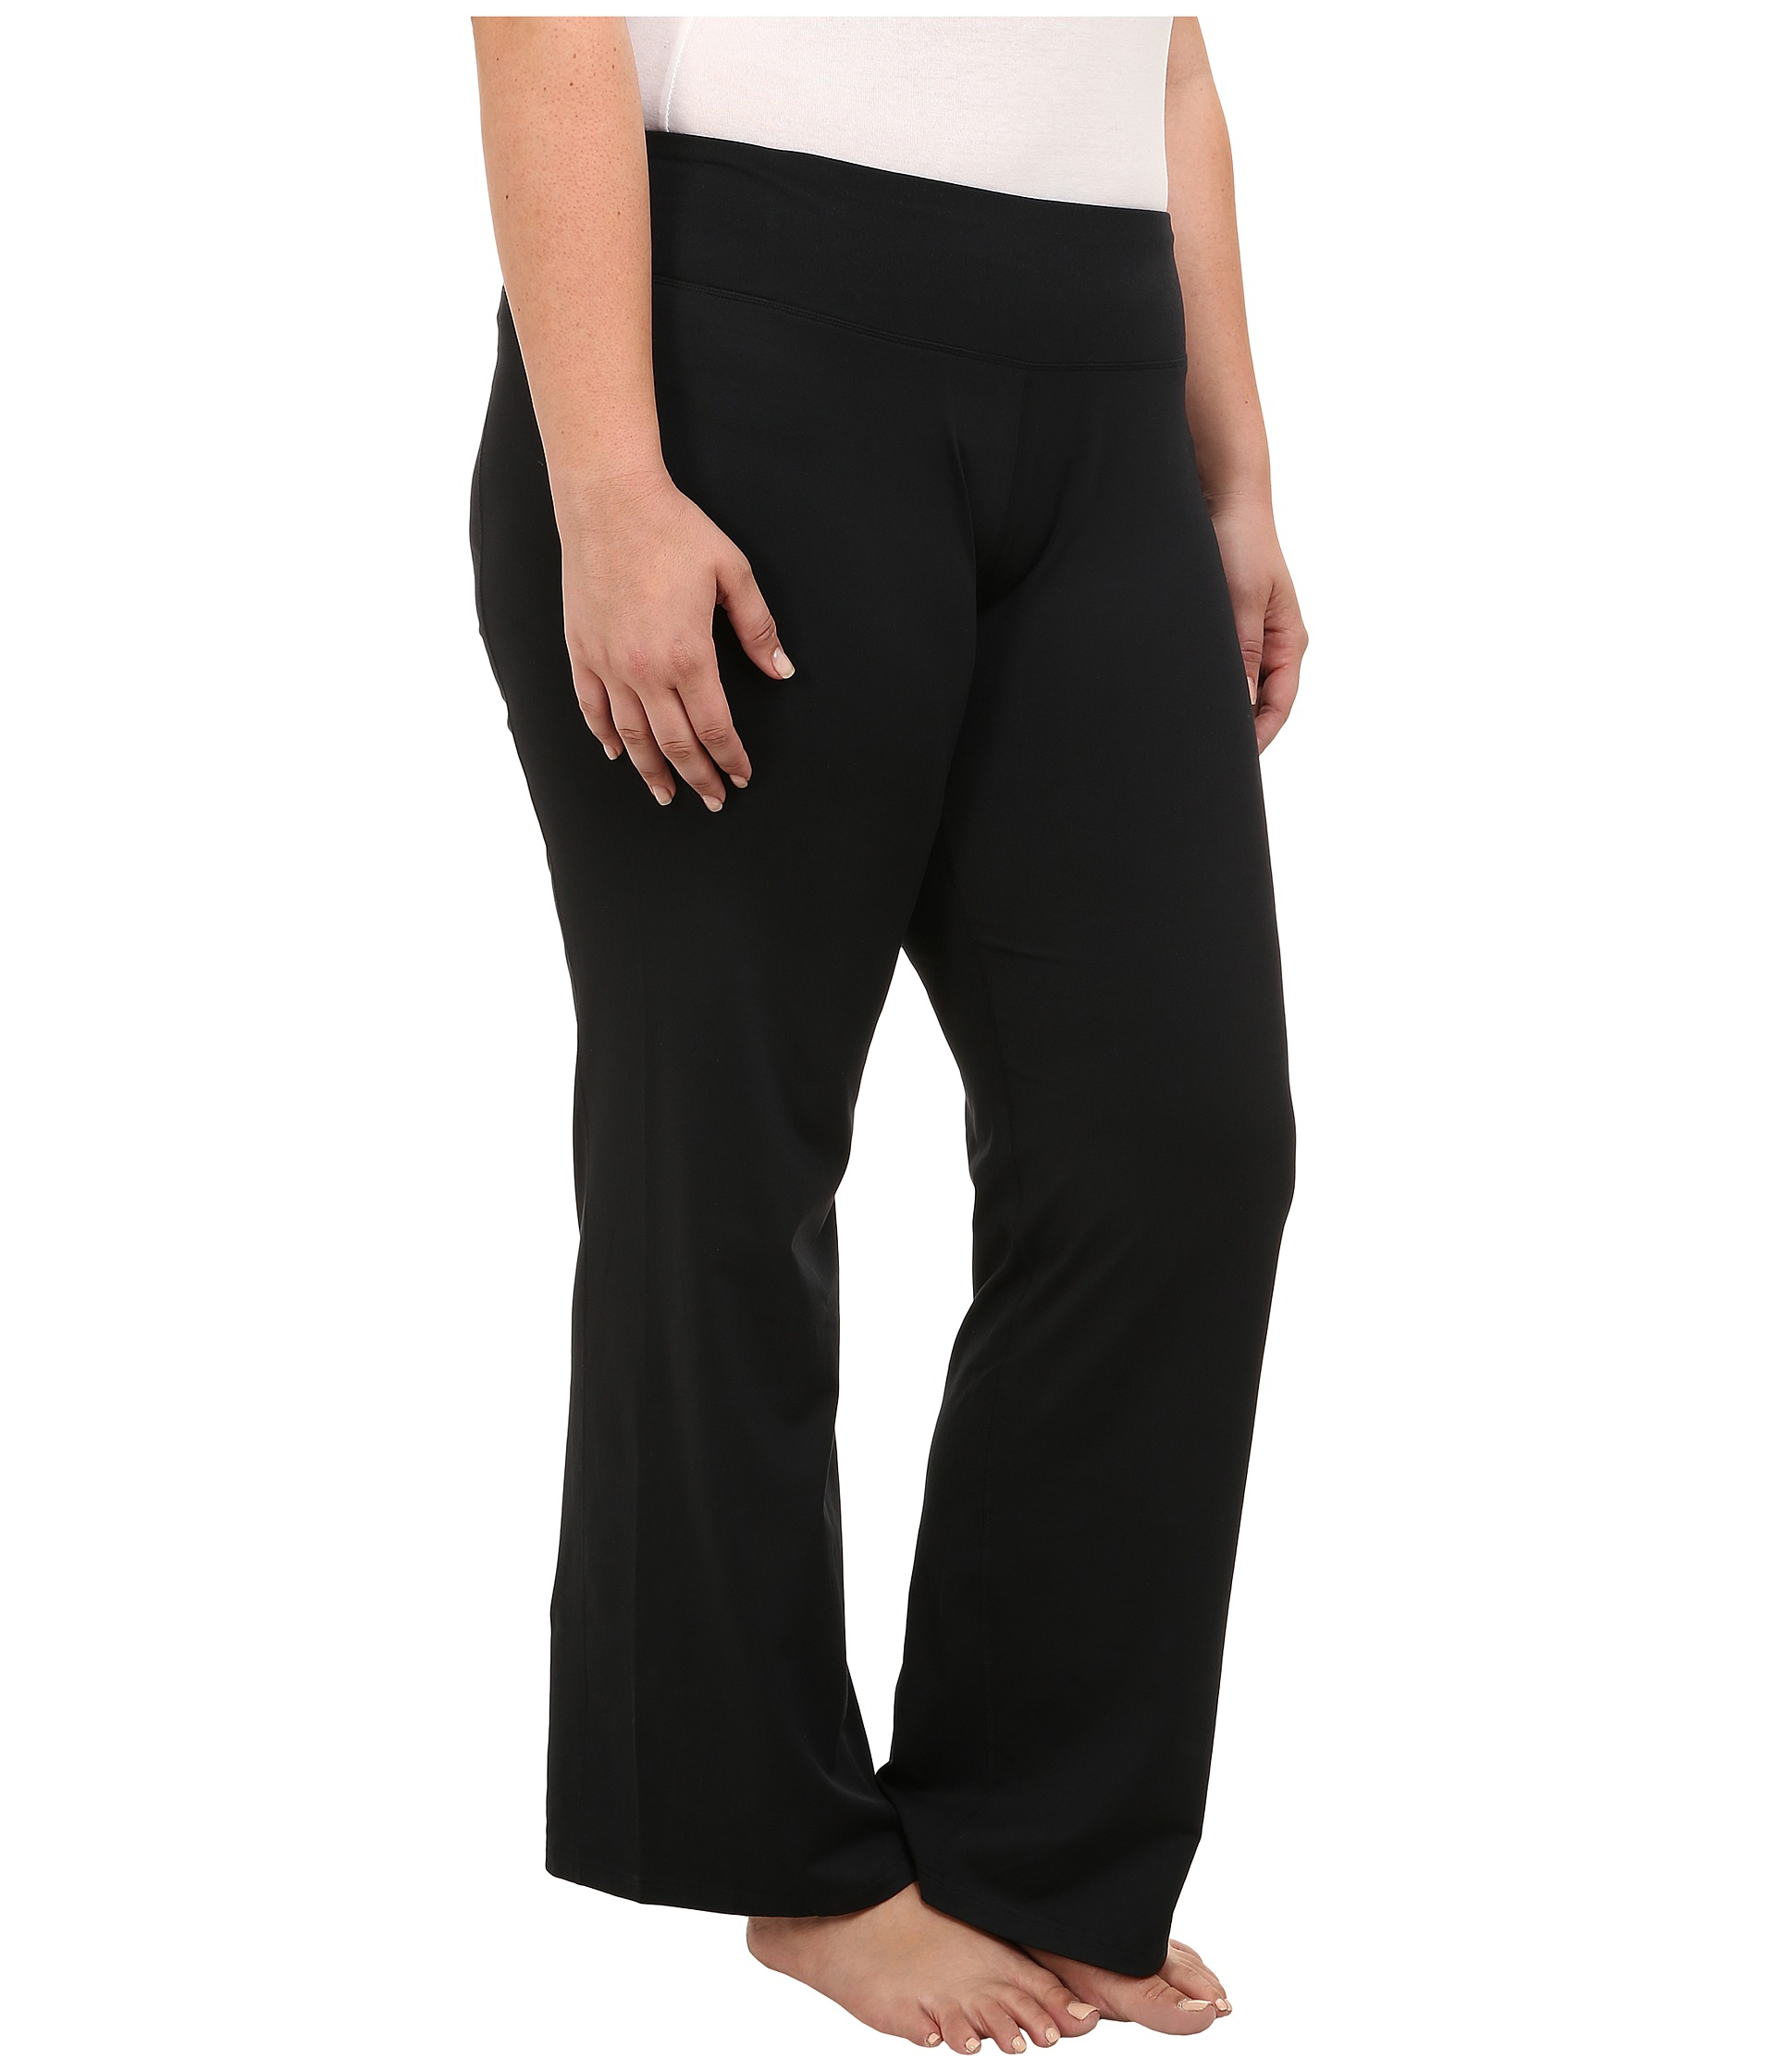 mesh legging king products black yoga the camo deborah gym white womens collection comfort deborahthecamokingleggingsrear comforter pants moving